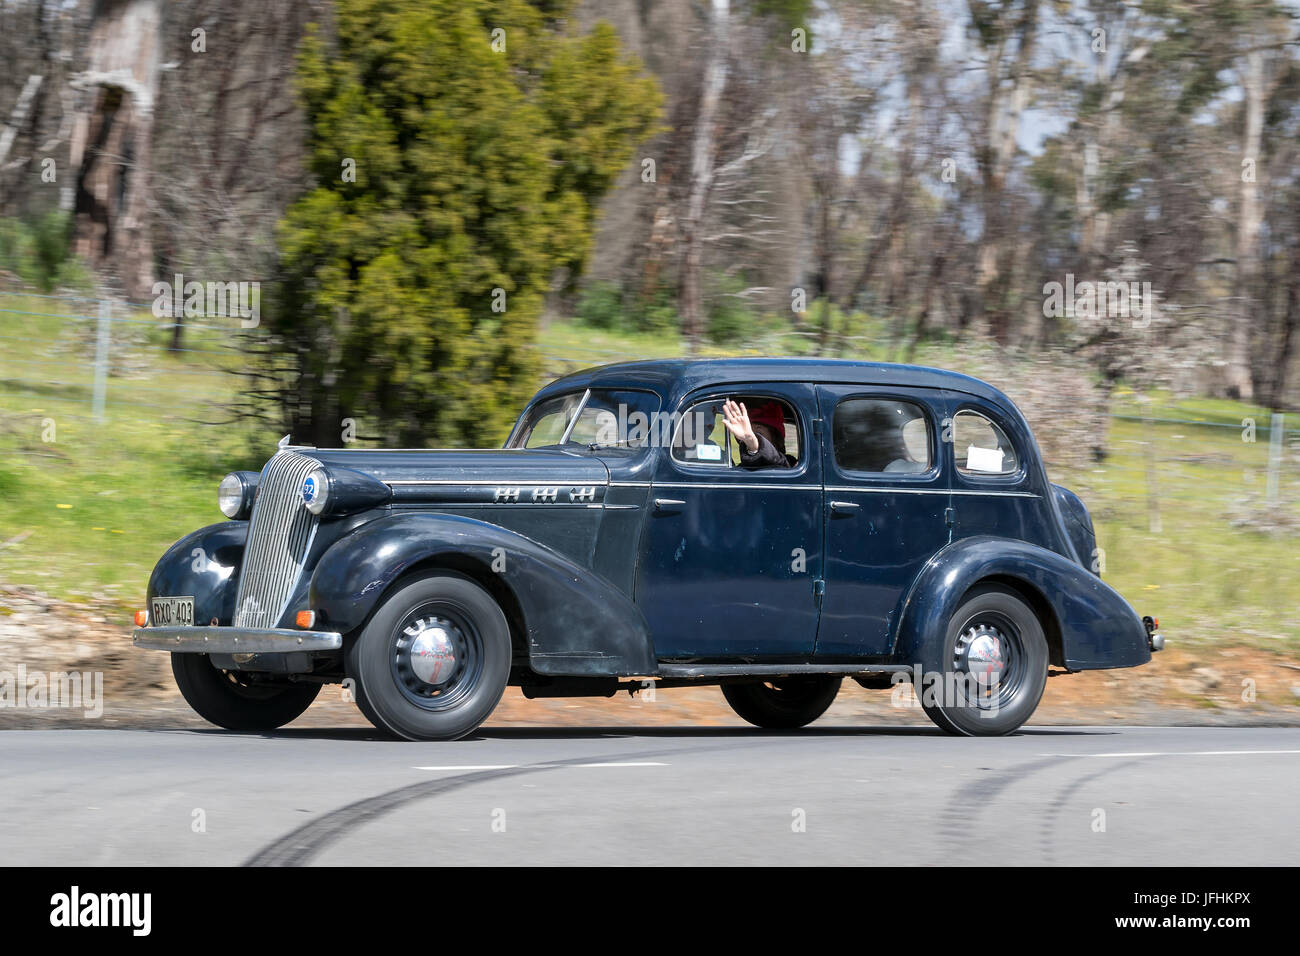 Vintage 1936 Oldsmobile FR Sedan driving on country roads near the town of Birdwood, South Australia. - Stock Image